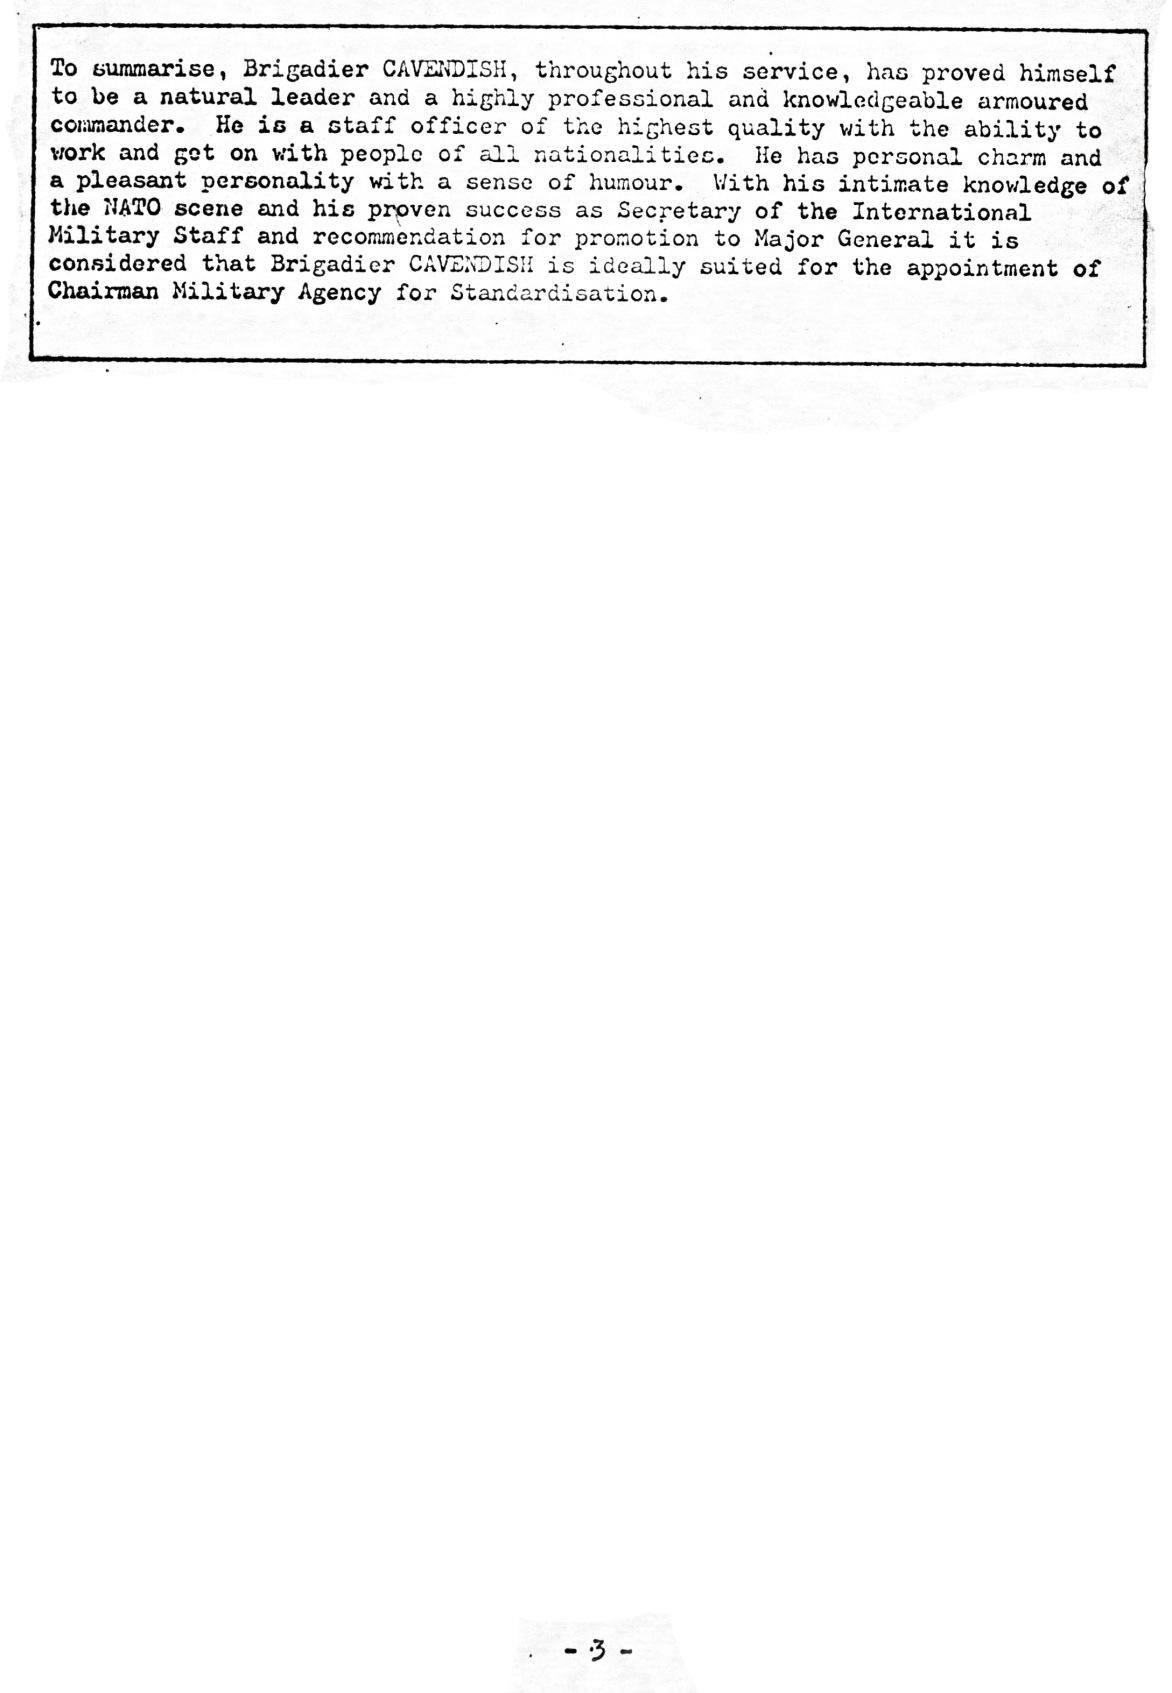 00831 977-07-12 Cargo na NATO - MOD UK comunica candidatura e currículo Brigadier P B Cavendish aos cargos NATO -pg 4